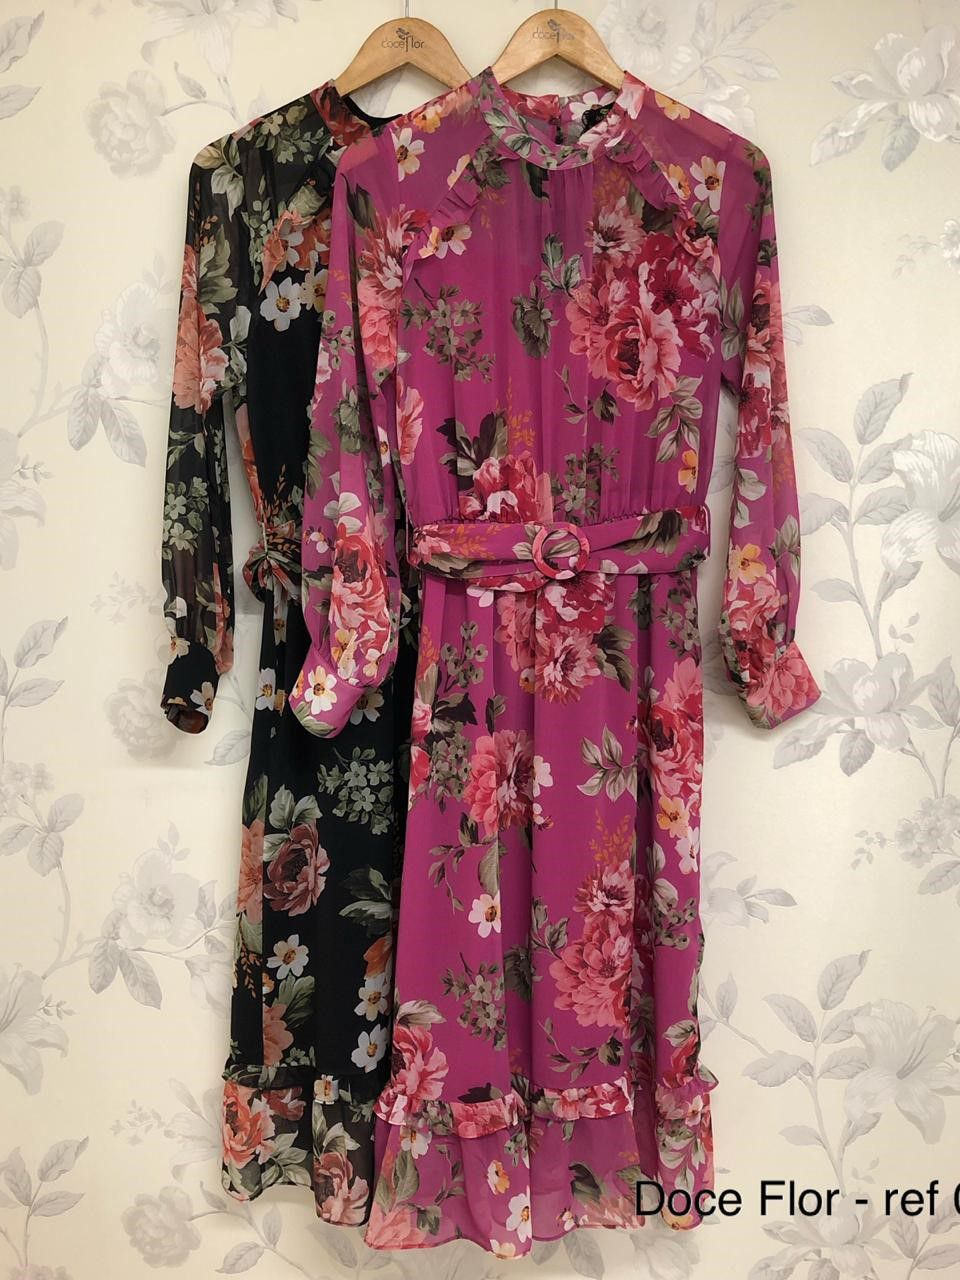 Vestido Midi Chiffon Manga Longa Estampa Floral Doce Flor Ariane